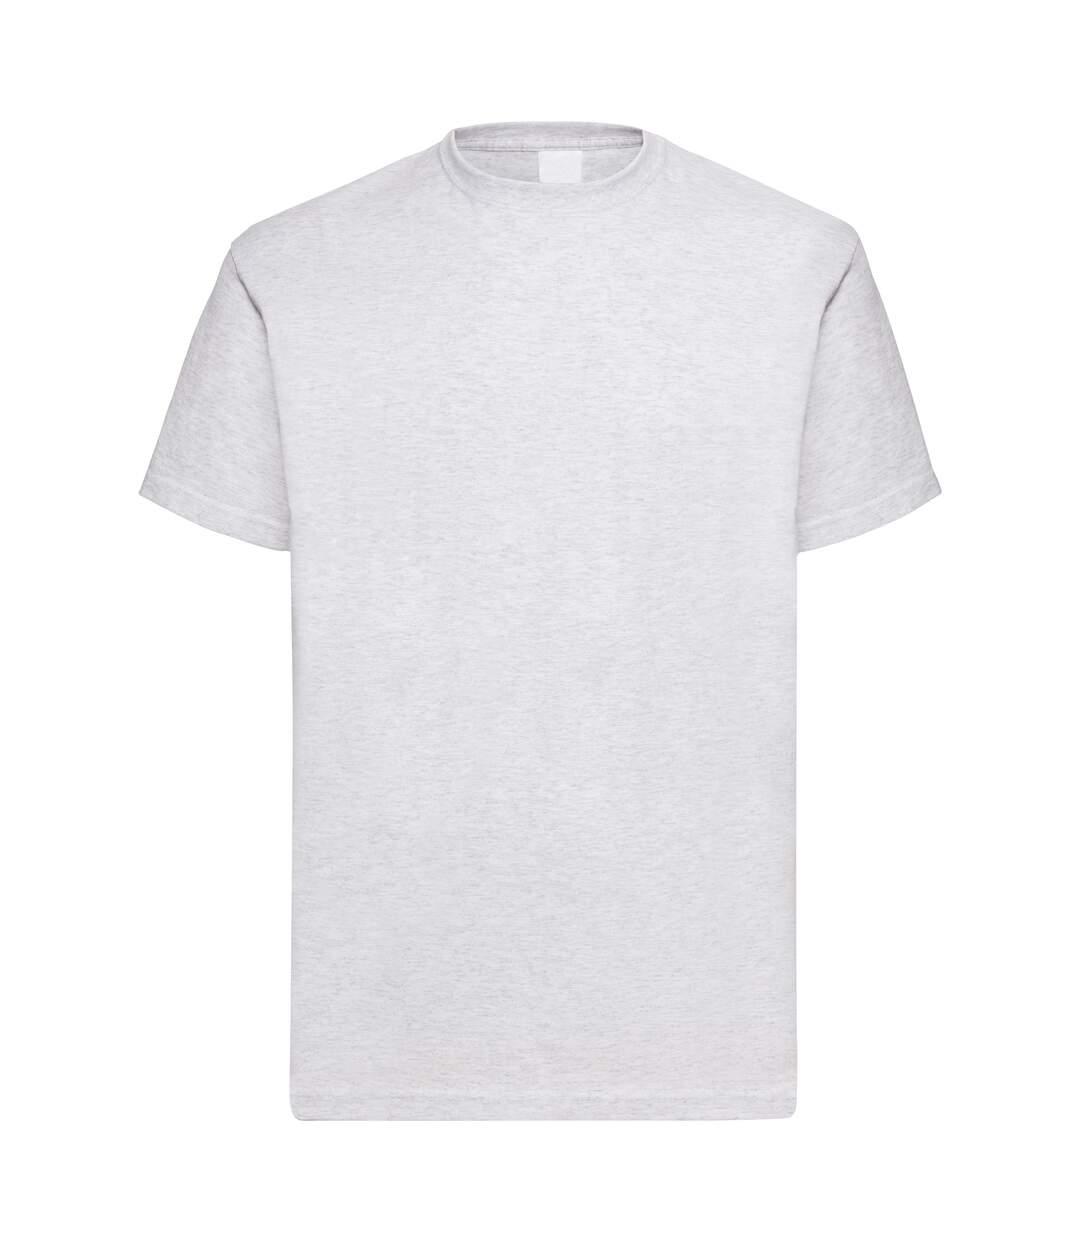 Mens Value Short Sleeve Casual T-Shirt (Ash) - UTBC3900